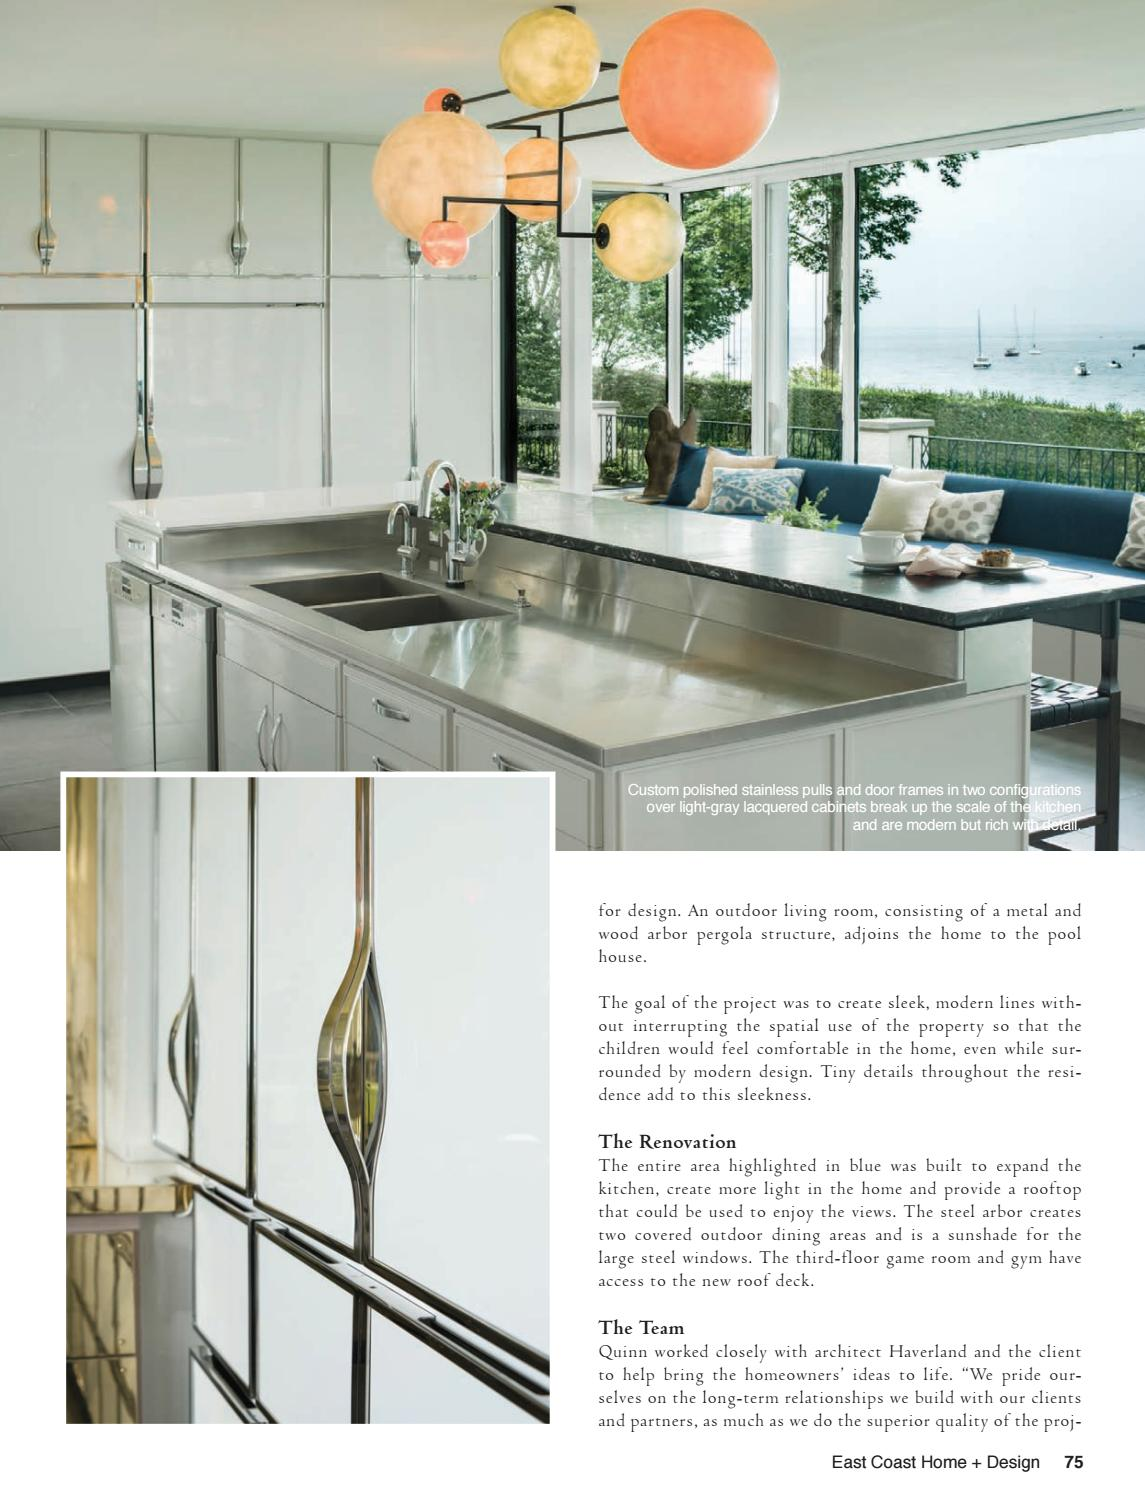 East Coast Home + Design by East Coast Home Publishing - issuu